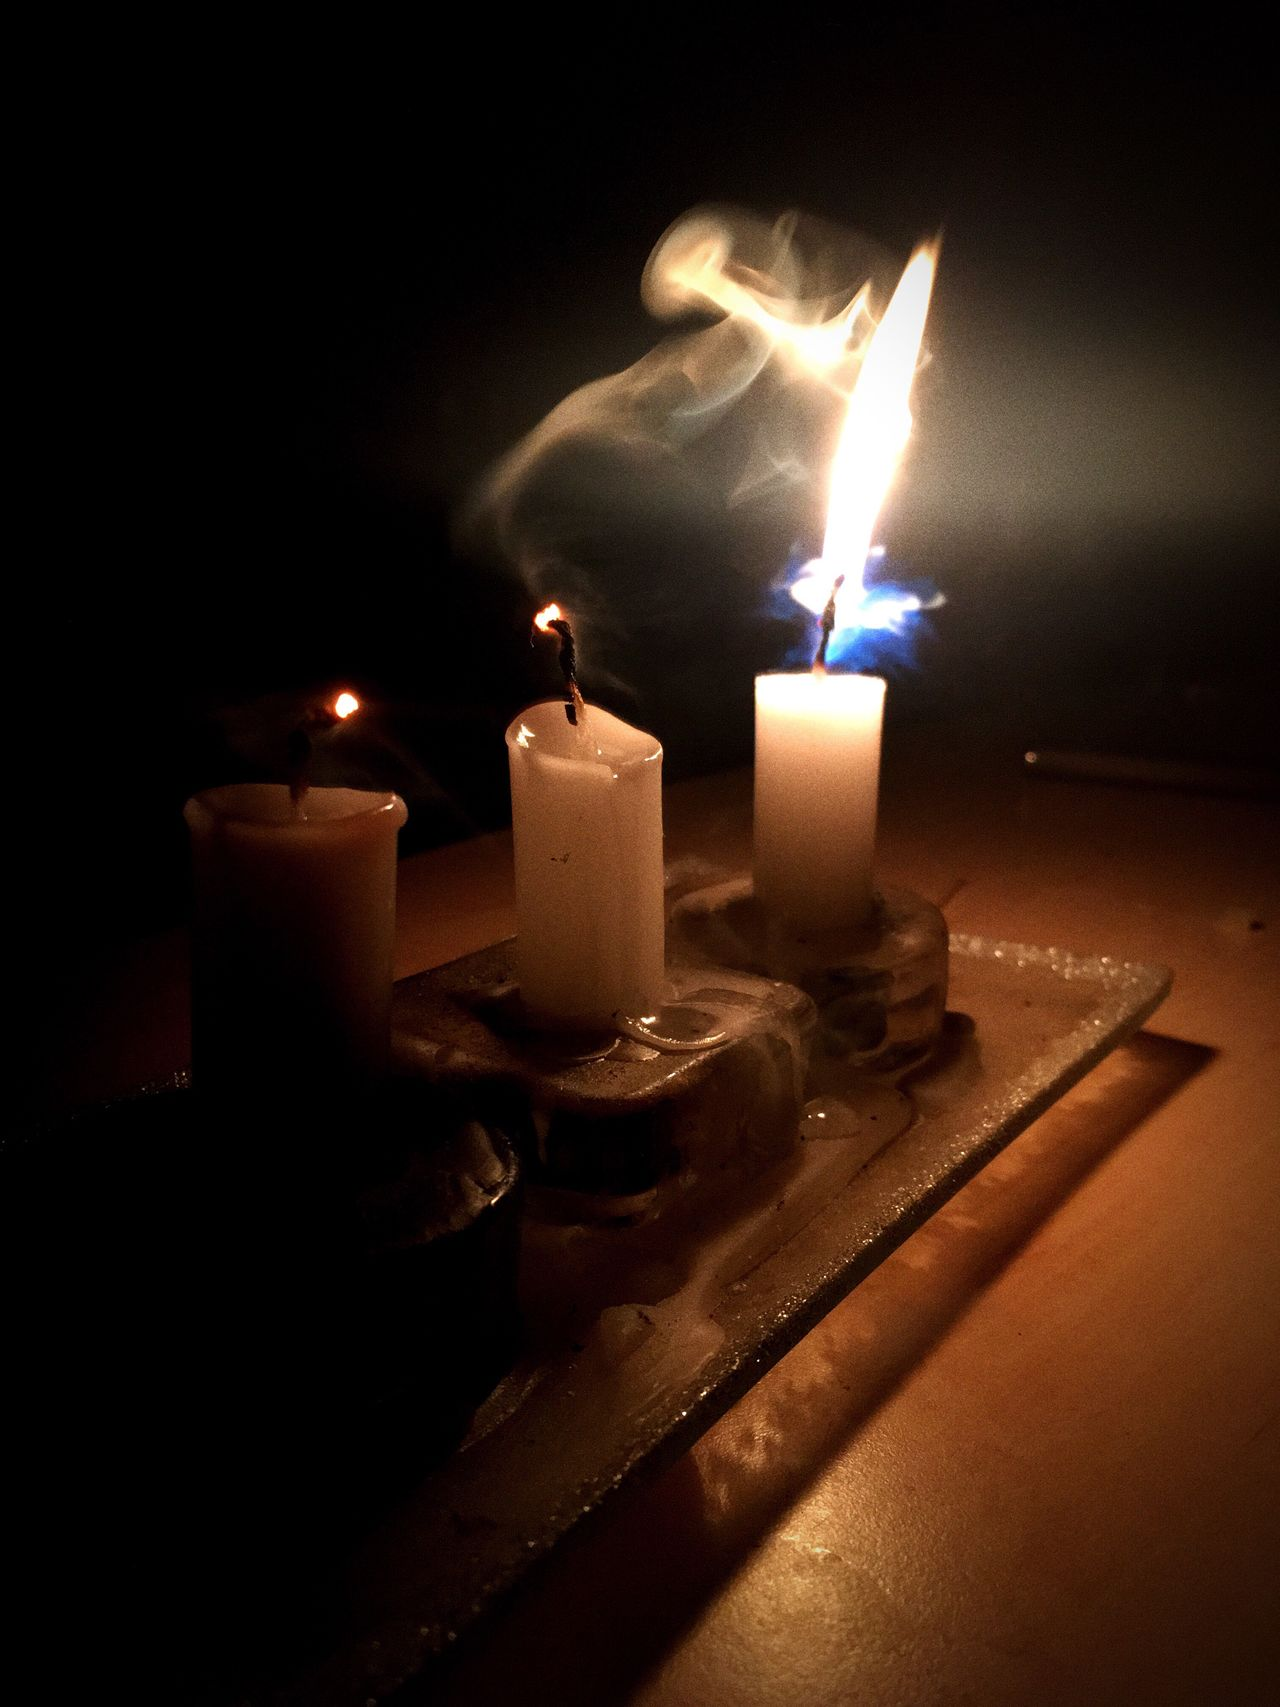 Flame Candle Burning Candlelight Heat - Temperature Close-up Indoors  Wax No People Illuminated Darkroom Black Background Tea Light Night